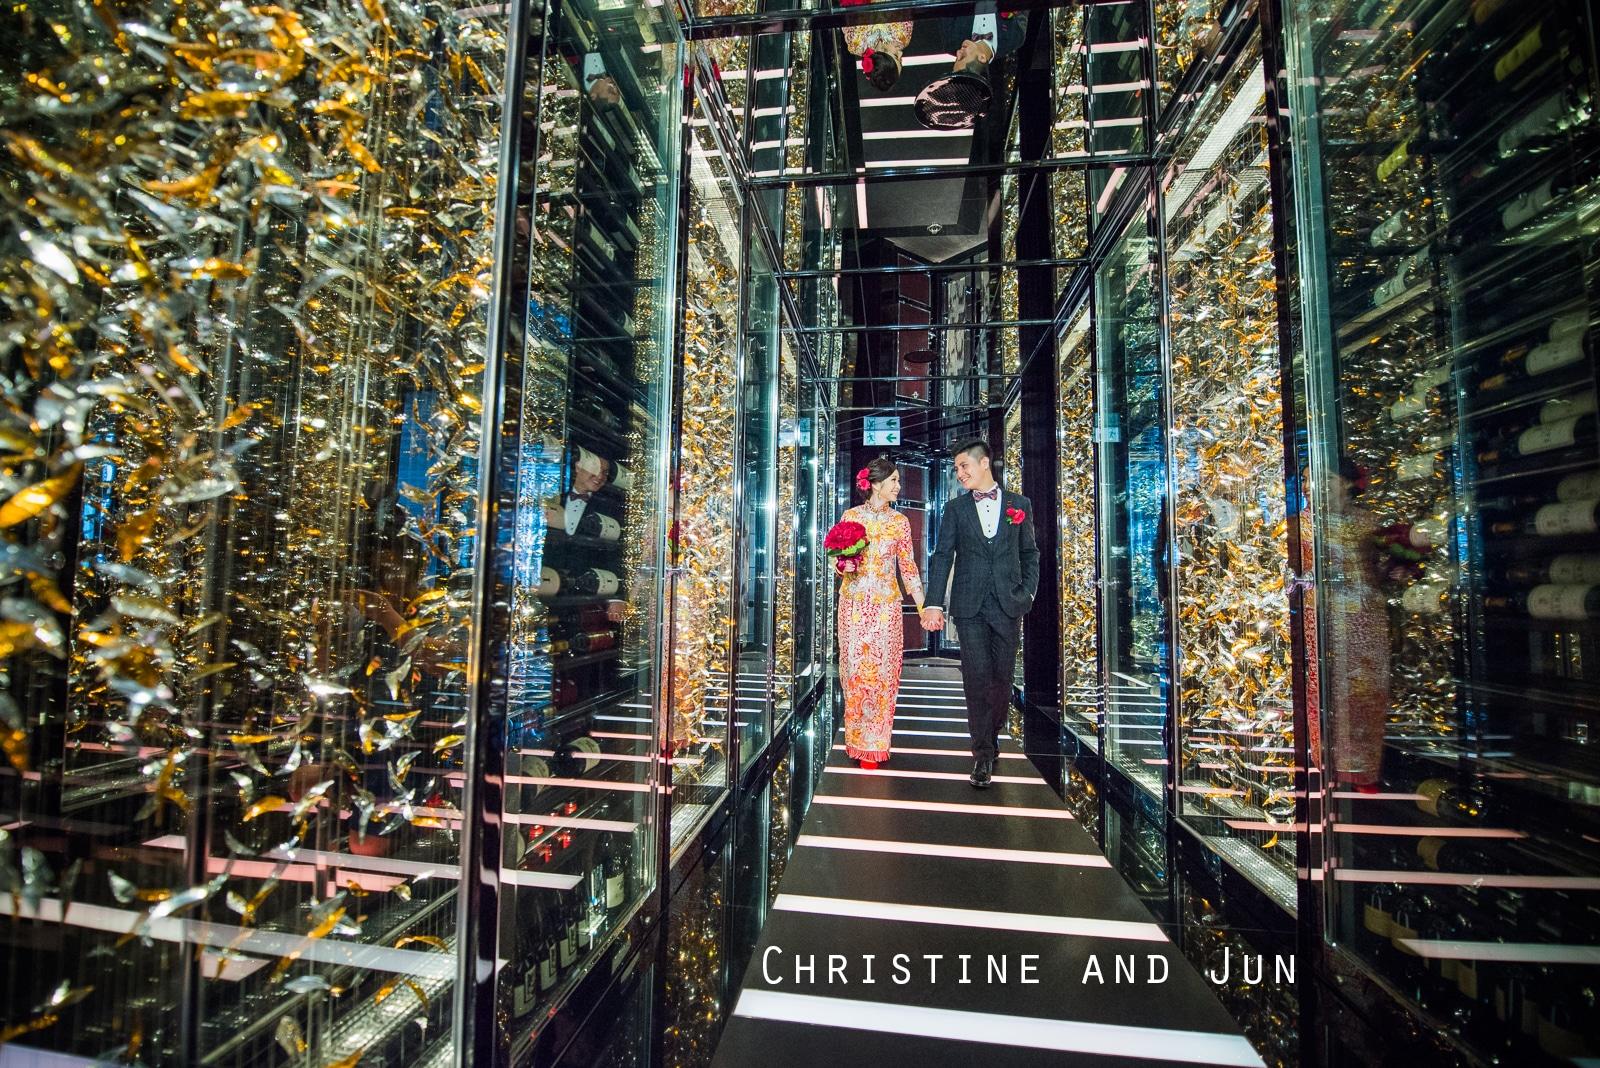 Christine and Jun wedding day